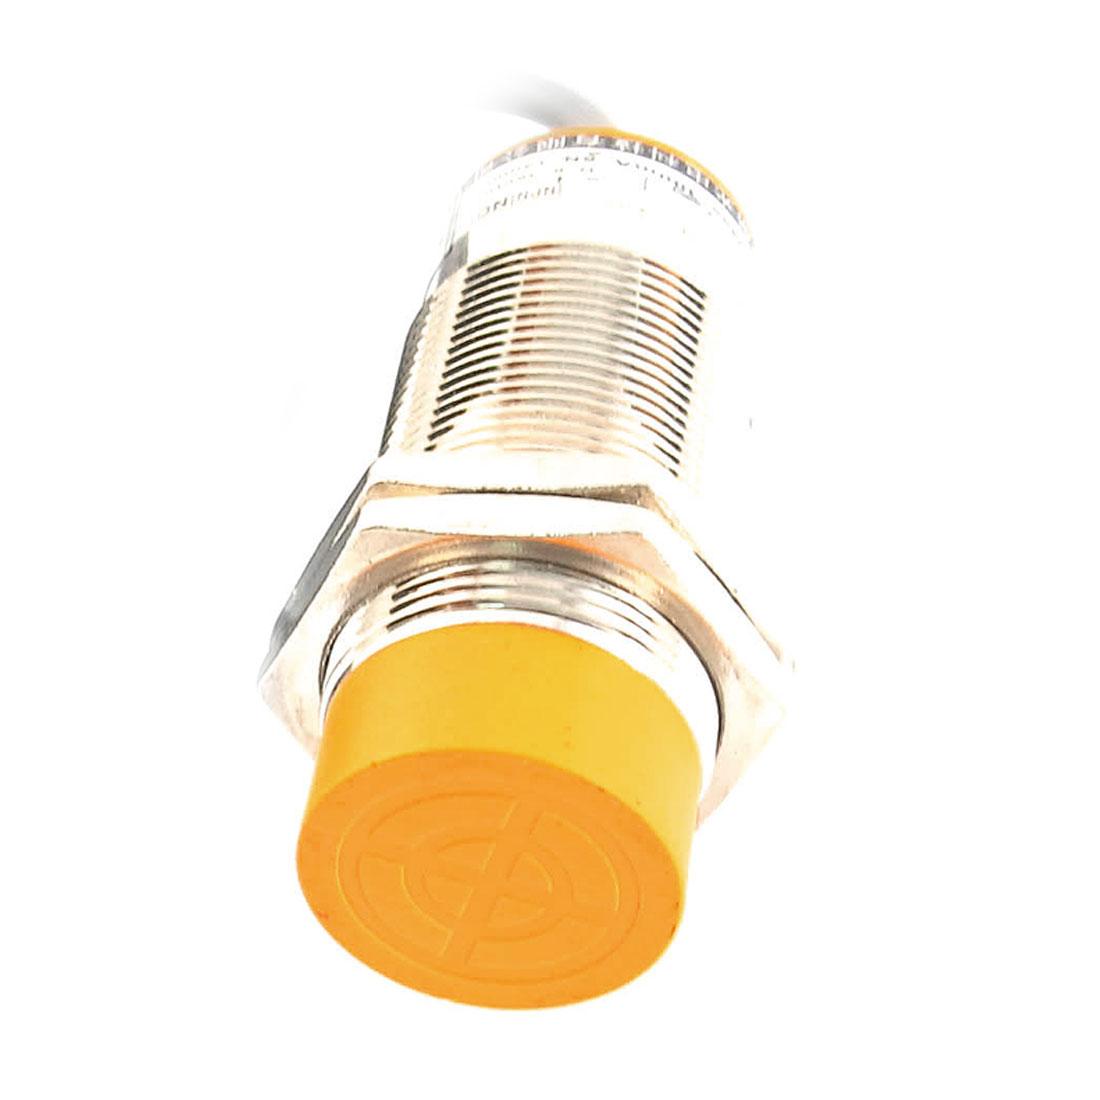 LJ30A3-15-Z/AX 30mm Thread 15mm Inductive Sensor Proximity Switch DC 6-36V